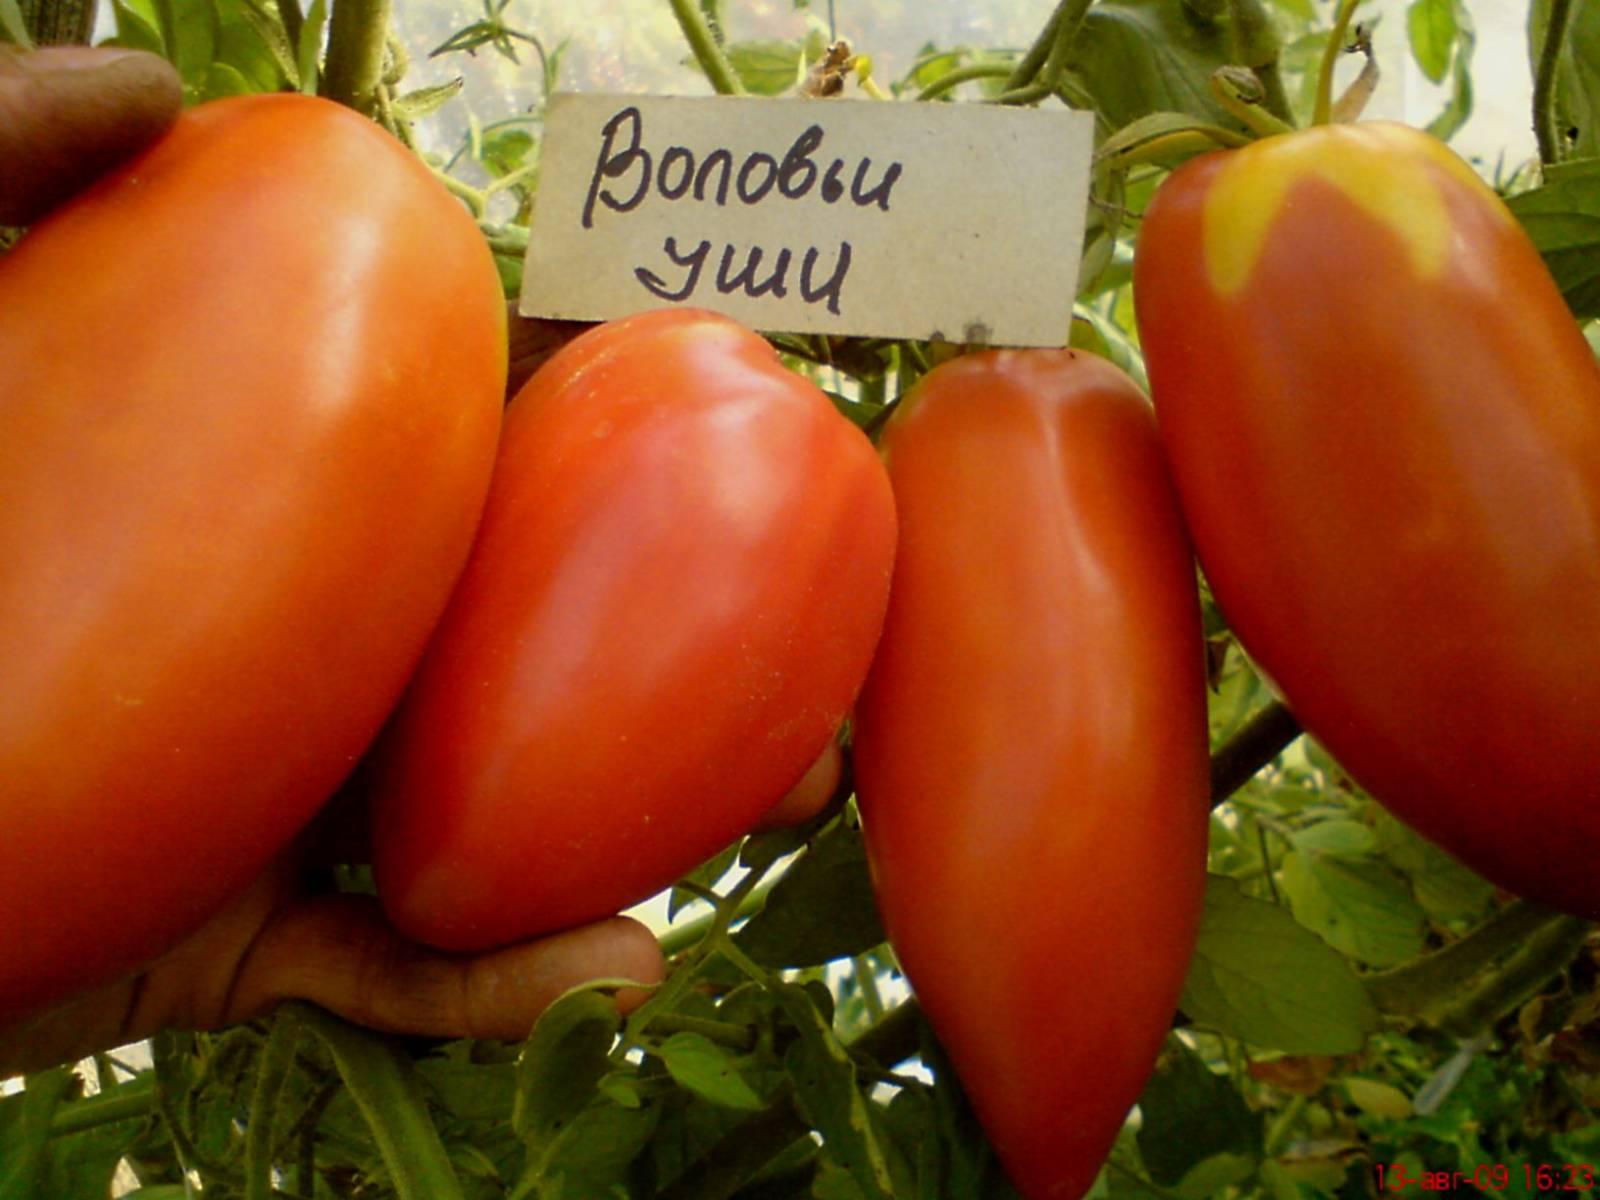 томат воловье ухо характеристика и описание сорта